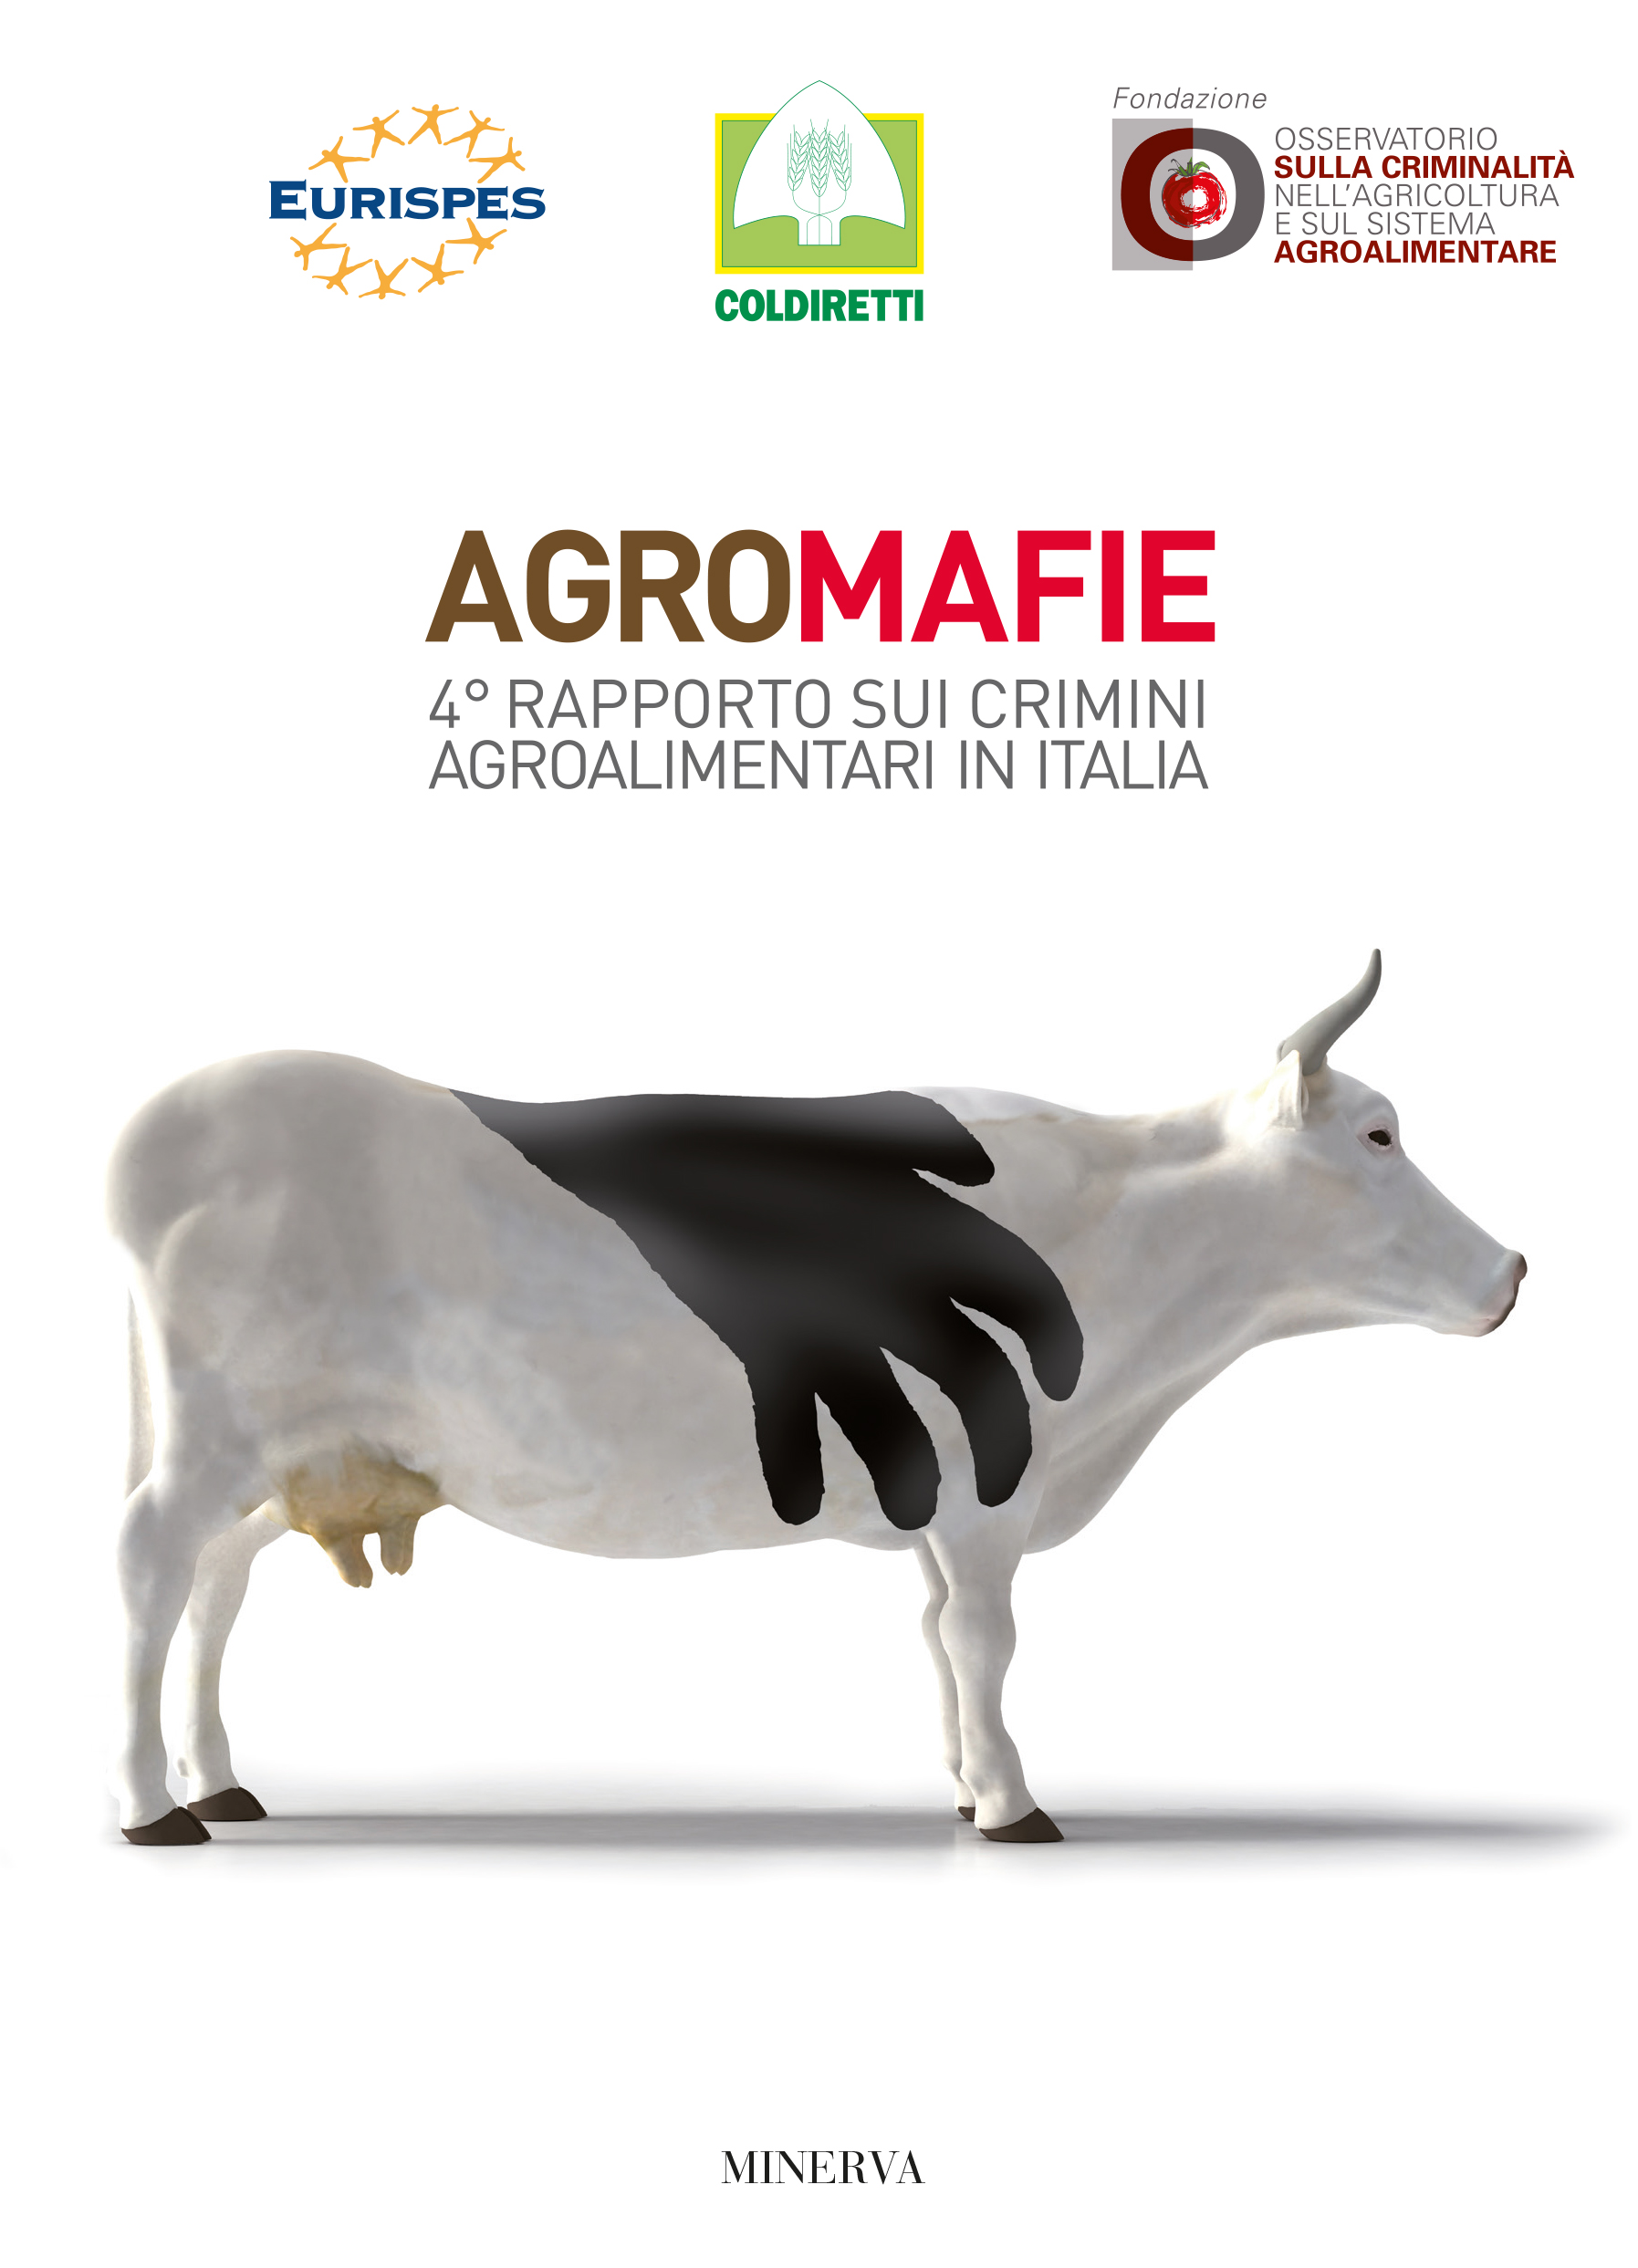 Agromafie